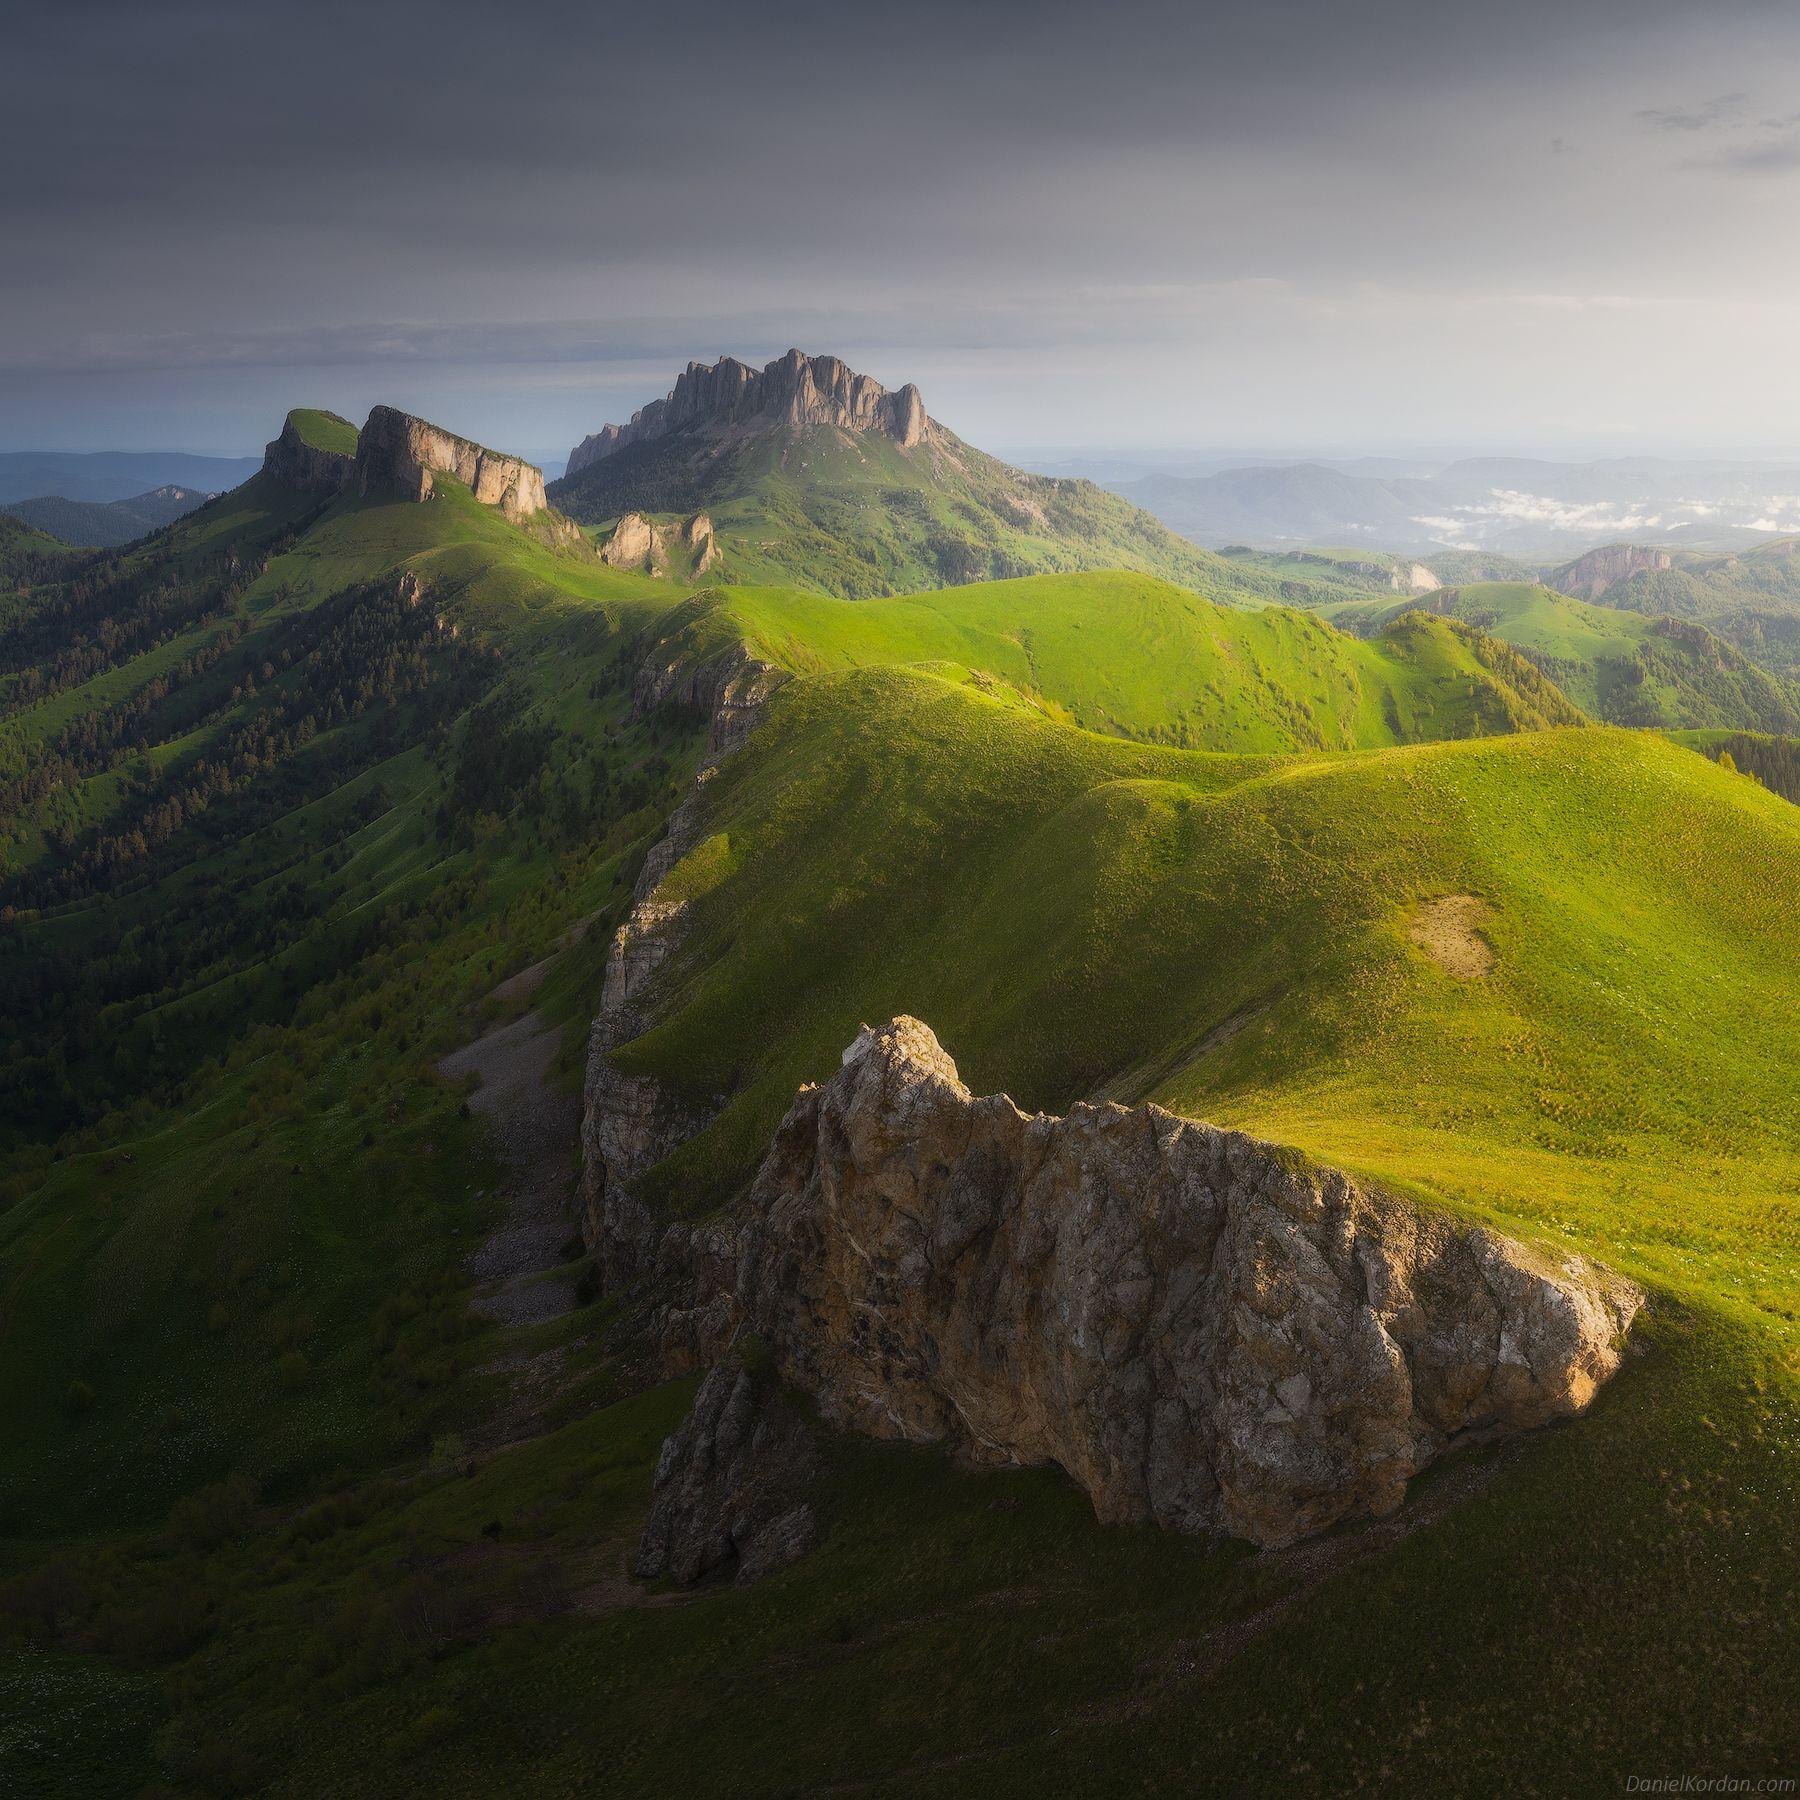 Кавказ, Адыгея, Тхач, Тхачи, Даниил Коржонов